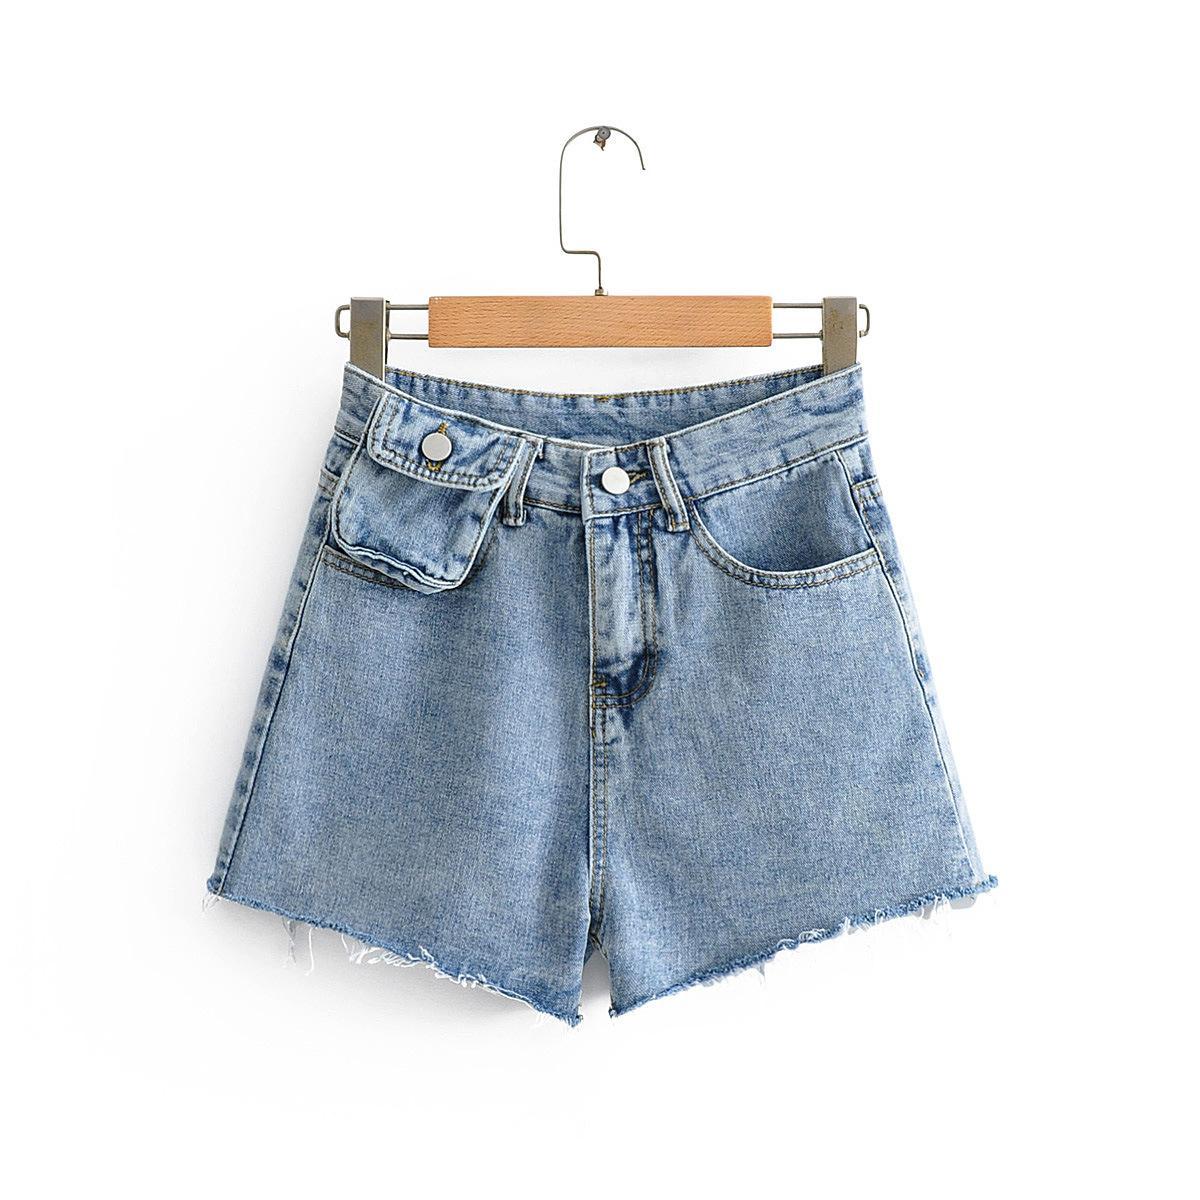 Femmes d'été Denim Jeans Shorts 2020 New Fashion Design Pack taille haute taille Denim Shorts Femme Sexy Shorts Pantalons Nightclub Pantalons Hot